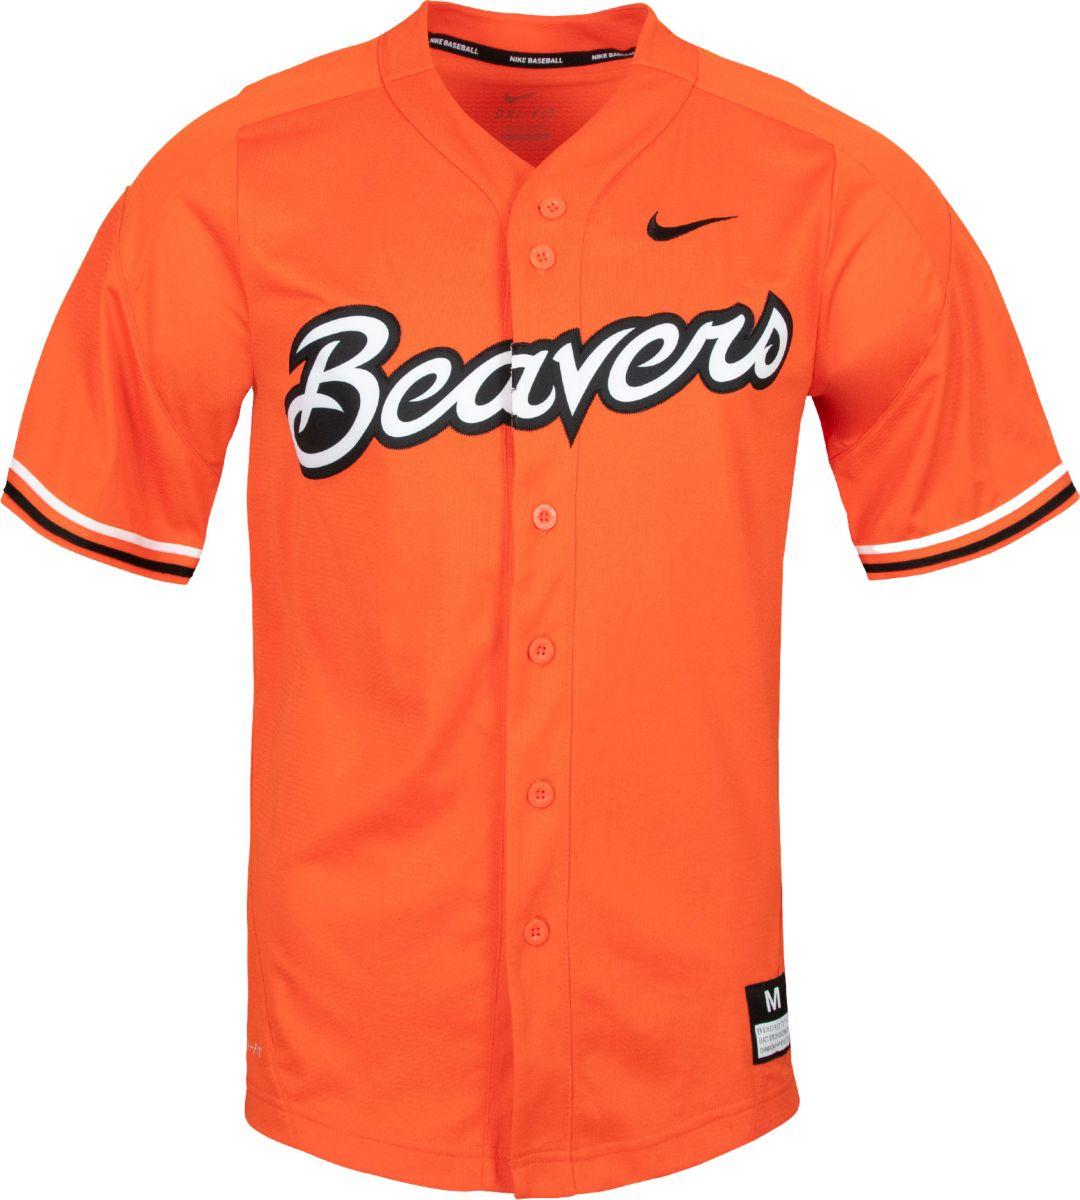 more photos 6a126 1650d Nike Men s Oregon State Beavers Orange Dri-FIT Replica Baseball Jersey.  noImageFound. Previous